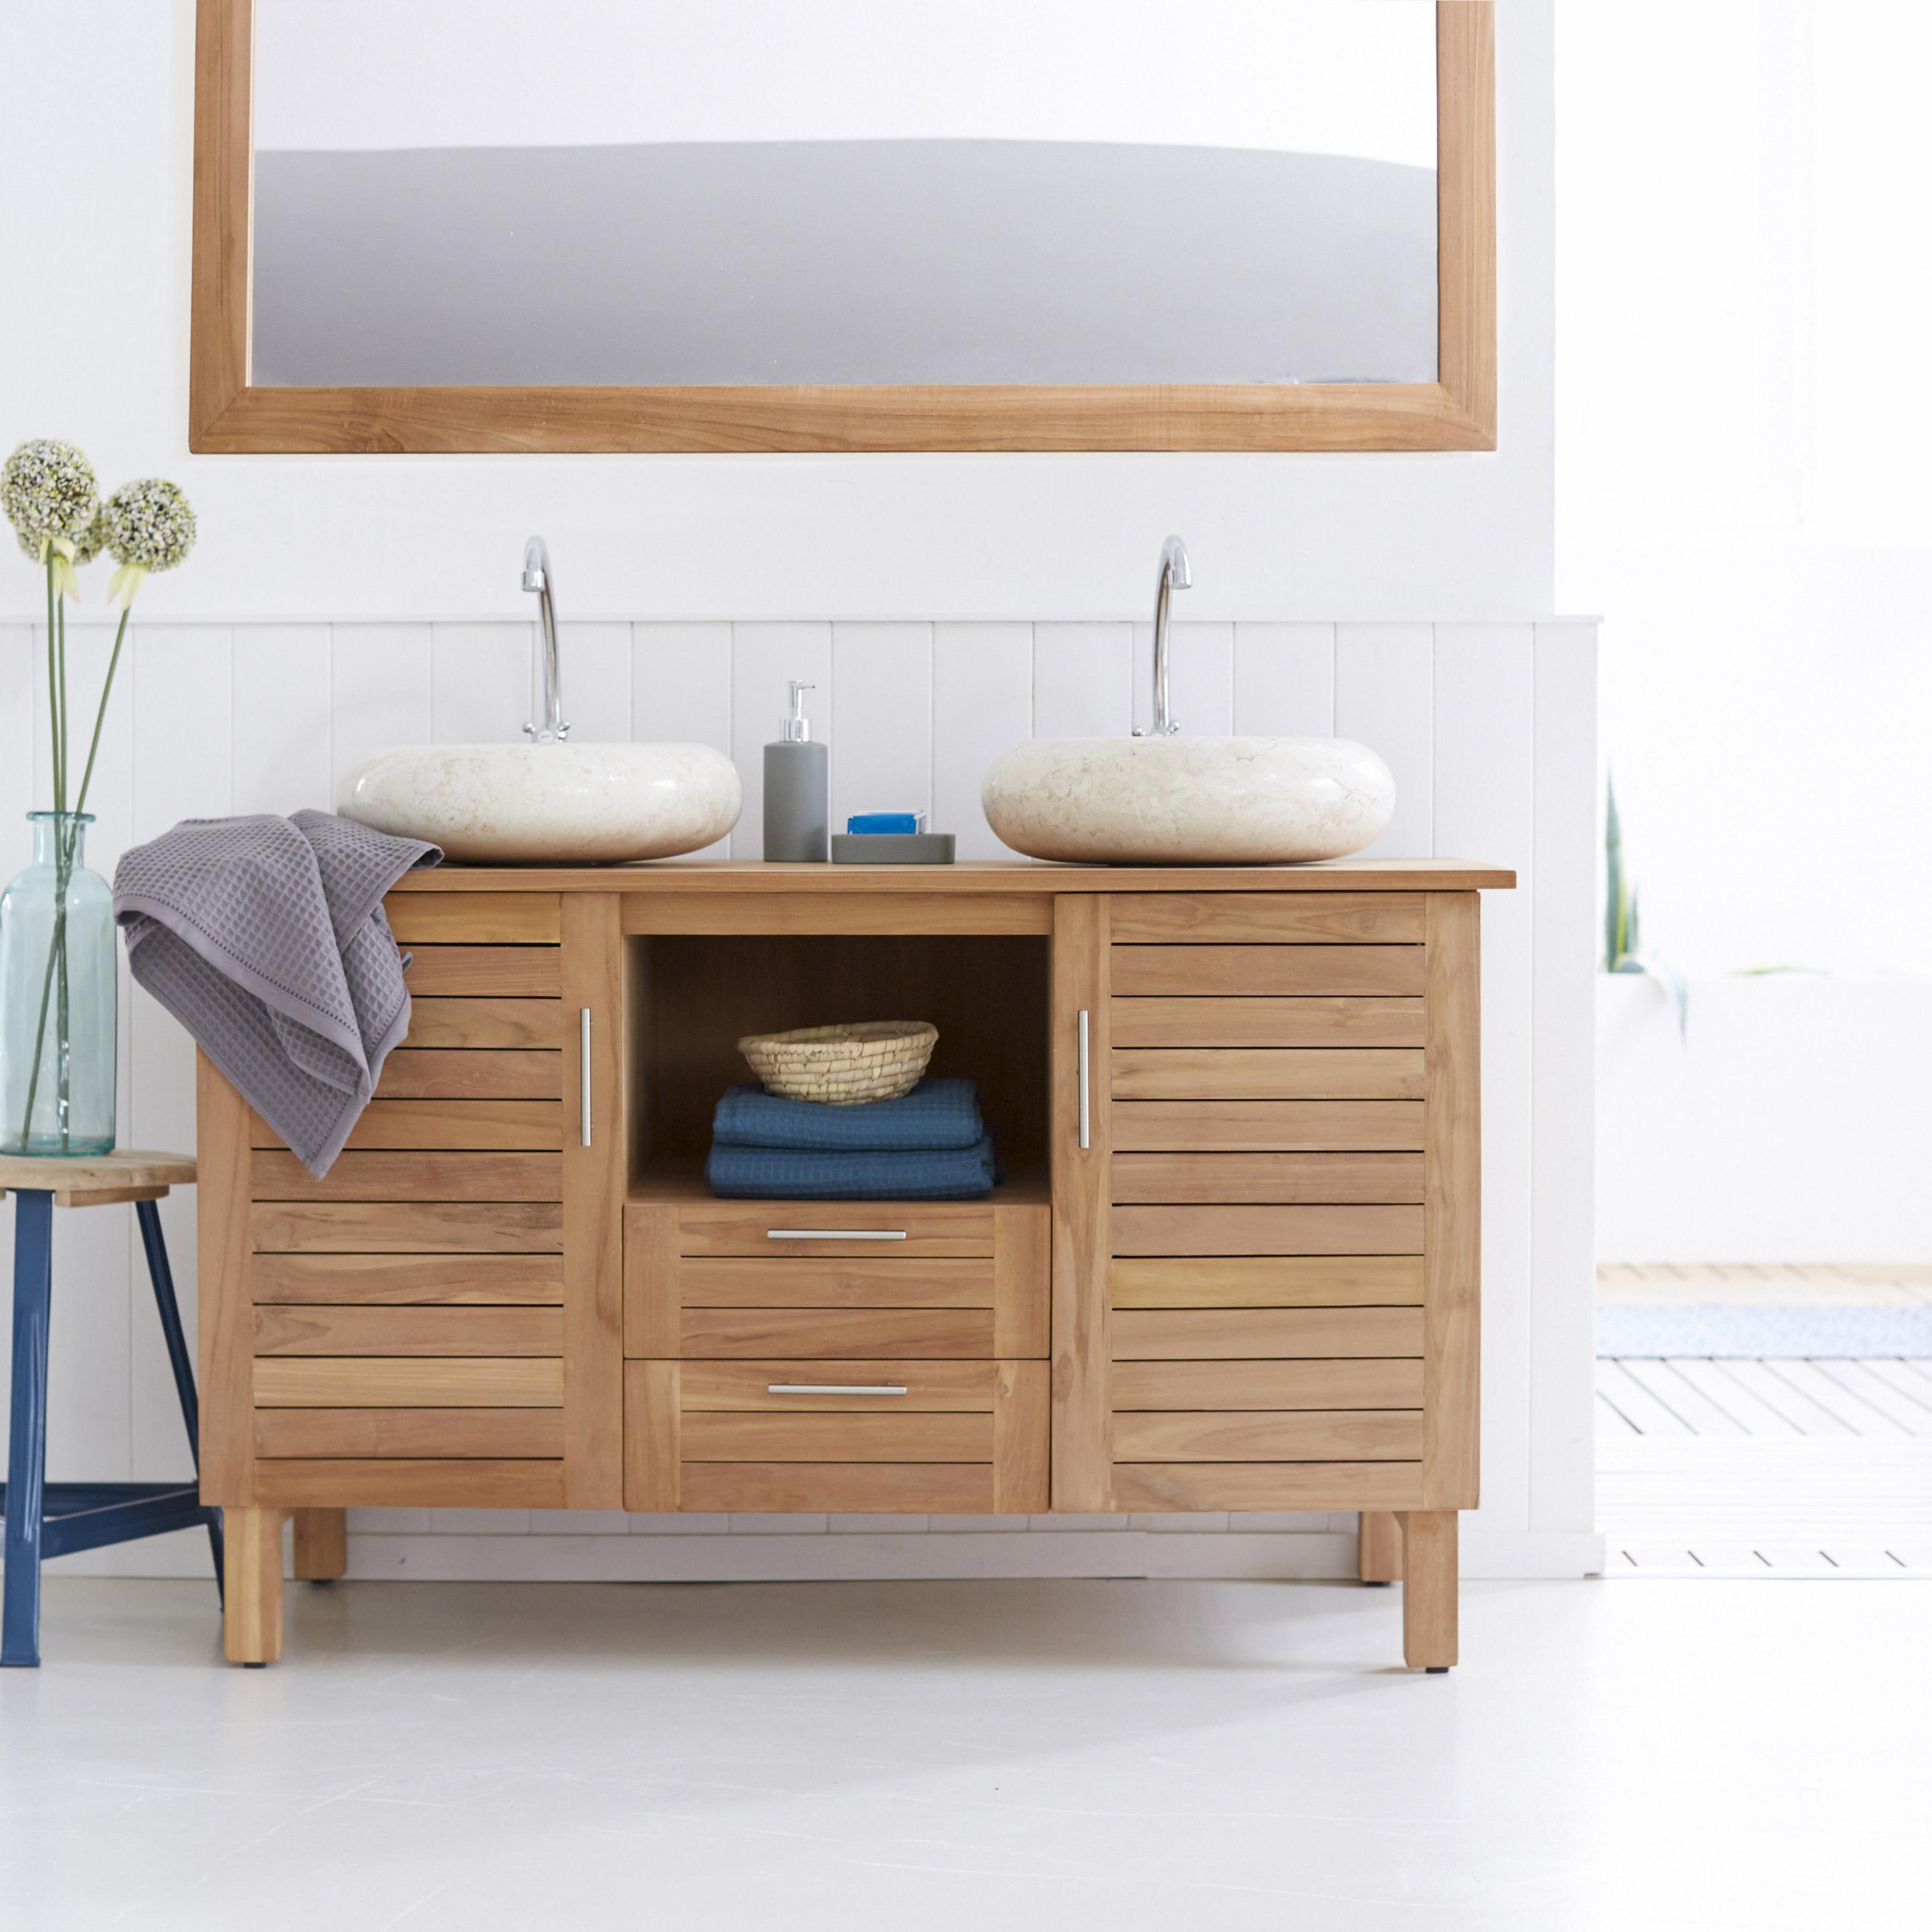 Meuble vasque bois, l.125 x H.75 x P.55 cm, TIKAMOON Soho